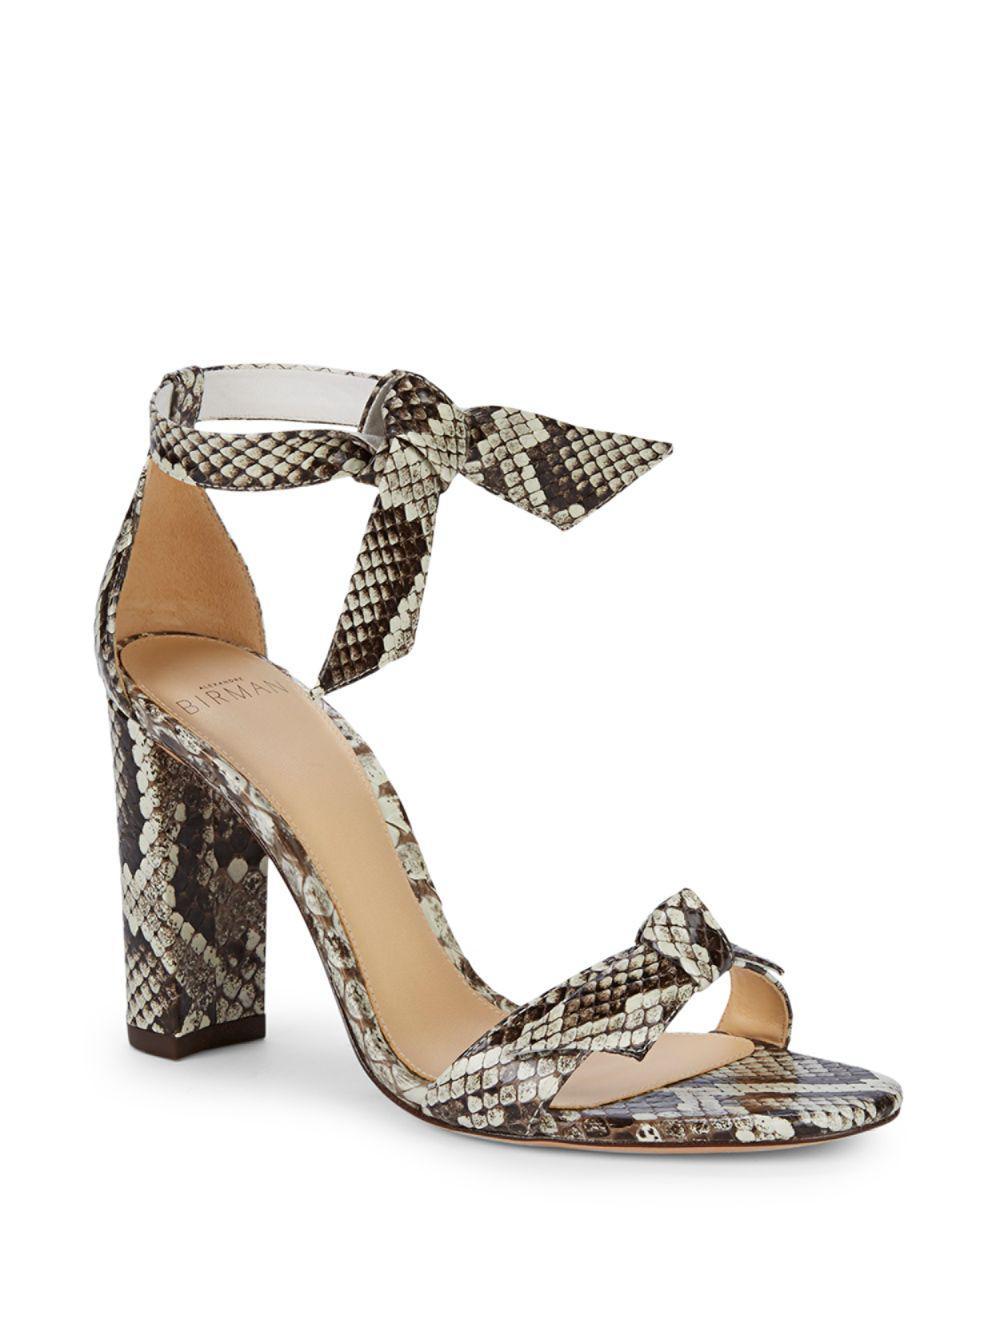 d8999e7aecdf Alexandre Birman Clarita Snakeskin Tie Sandals in Natural - Lyst